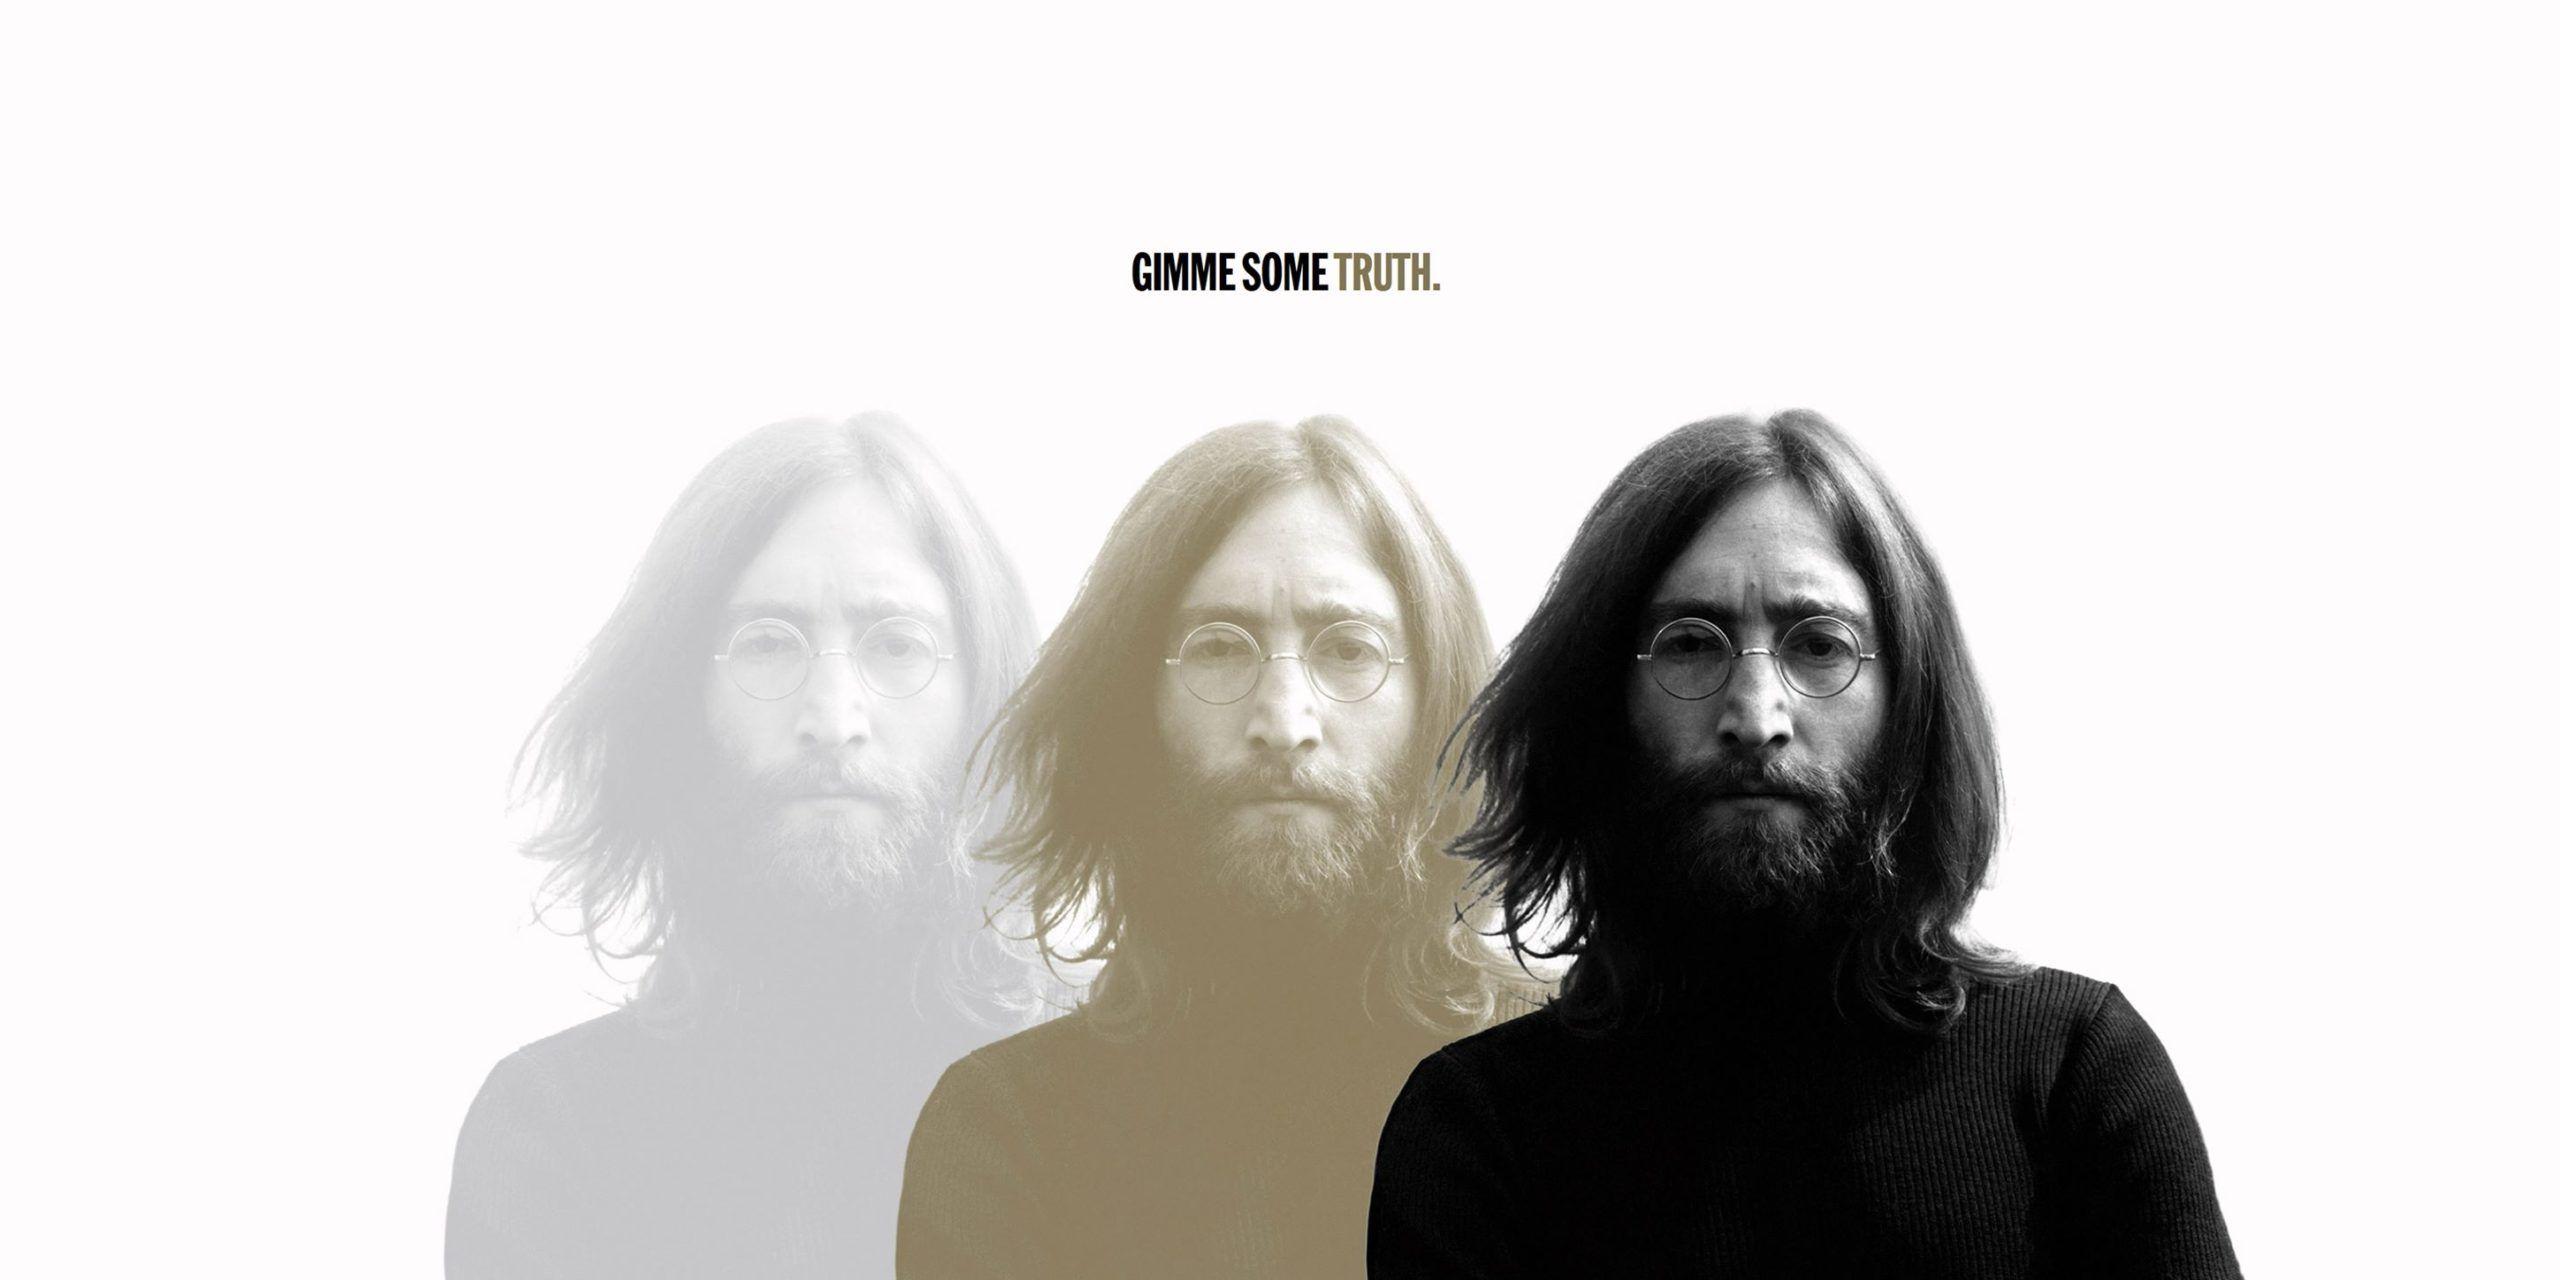 """Gimme Some Truth"" de John Lennon ya está disponible"